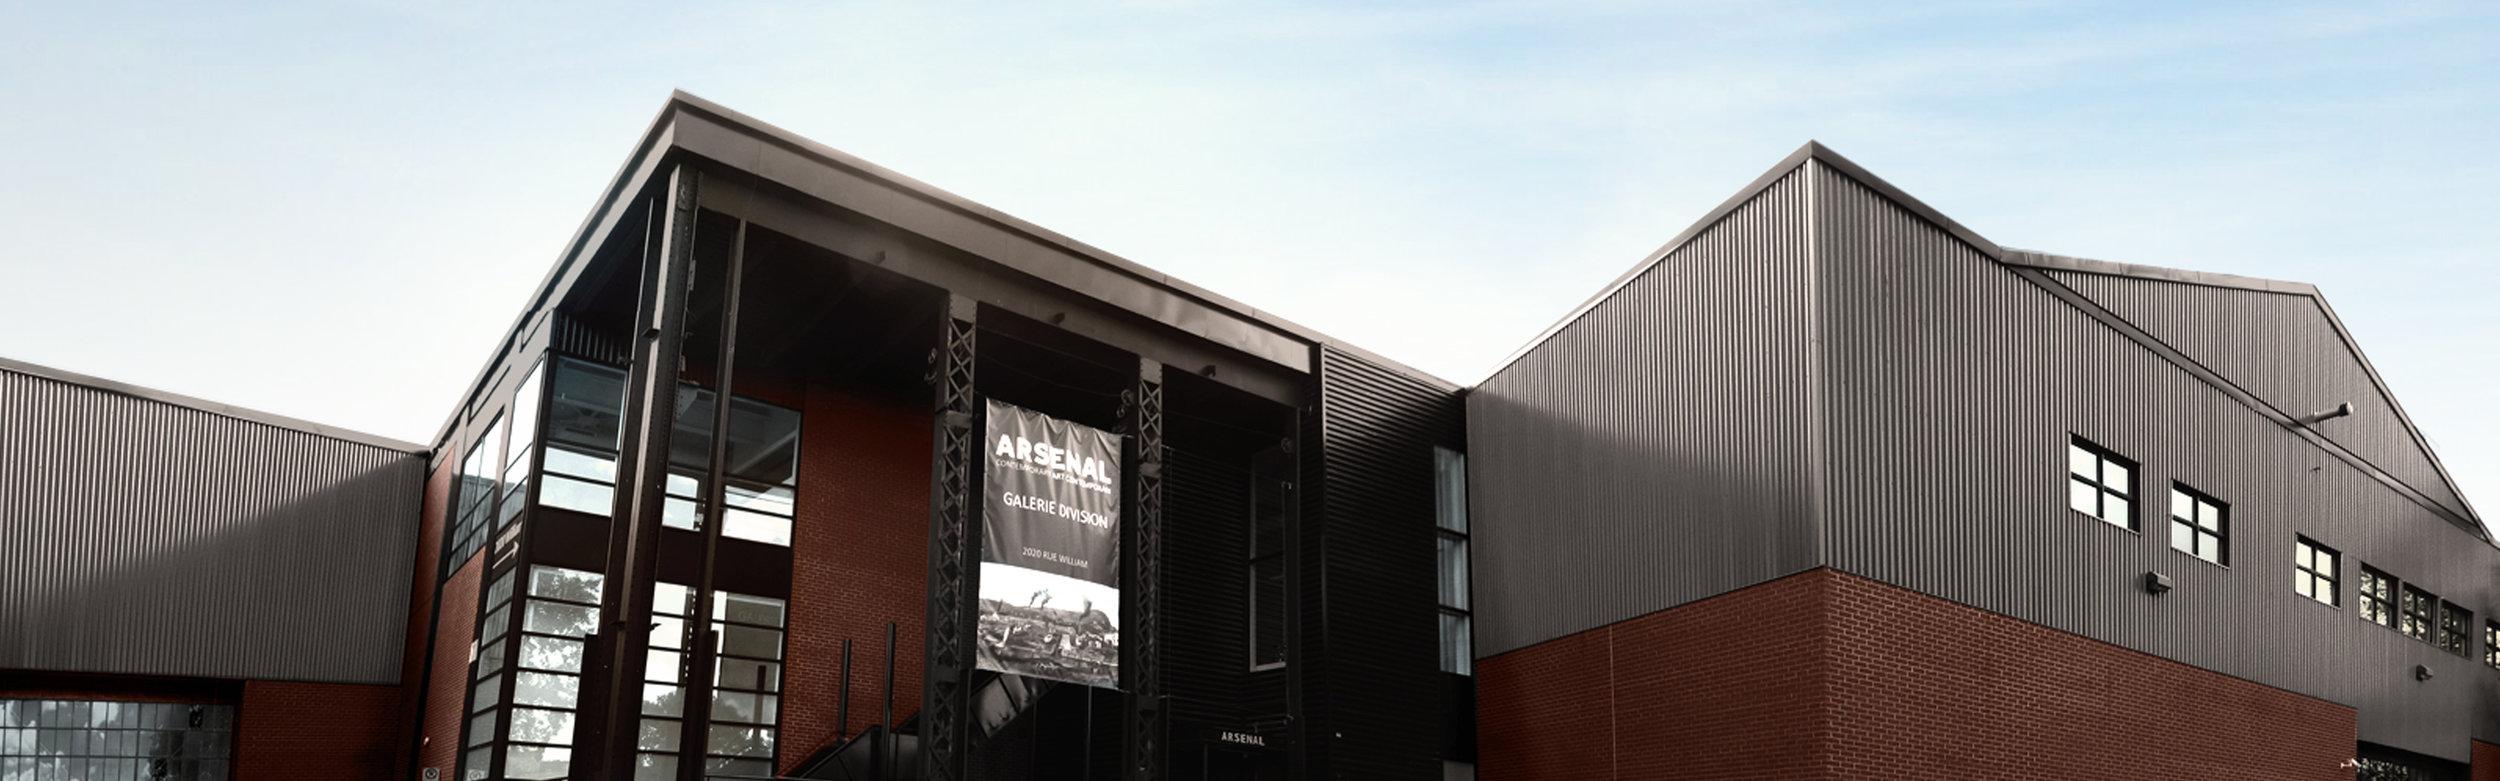 Arsenal art contemporain Montréal